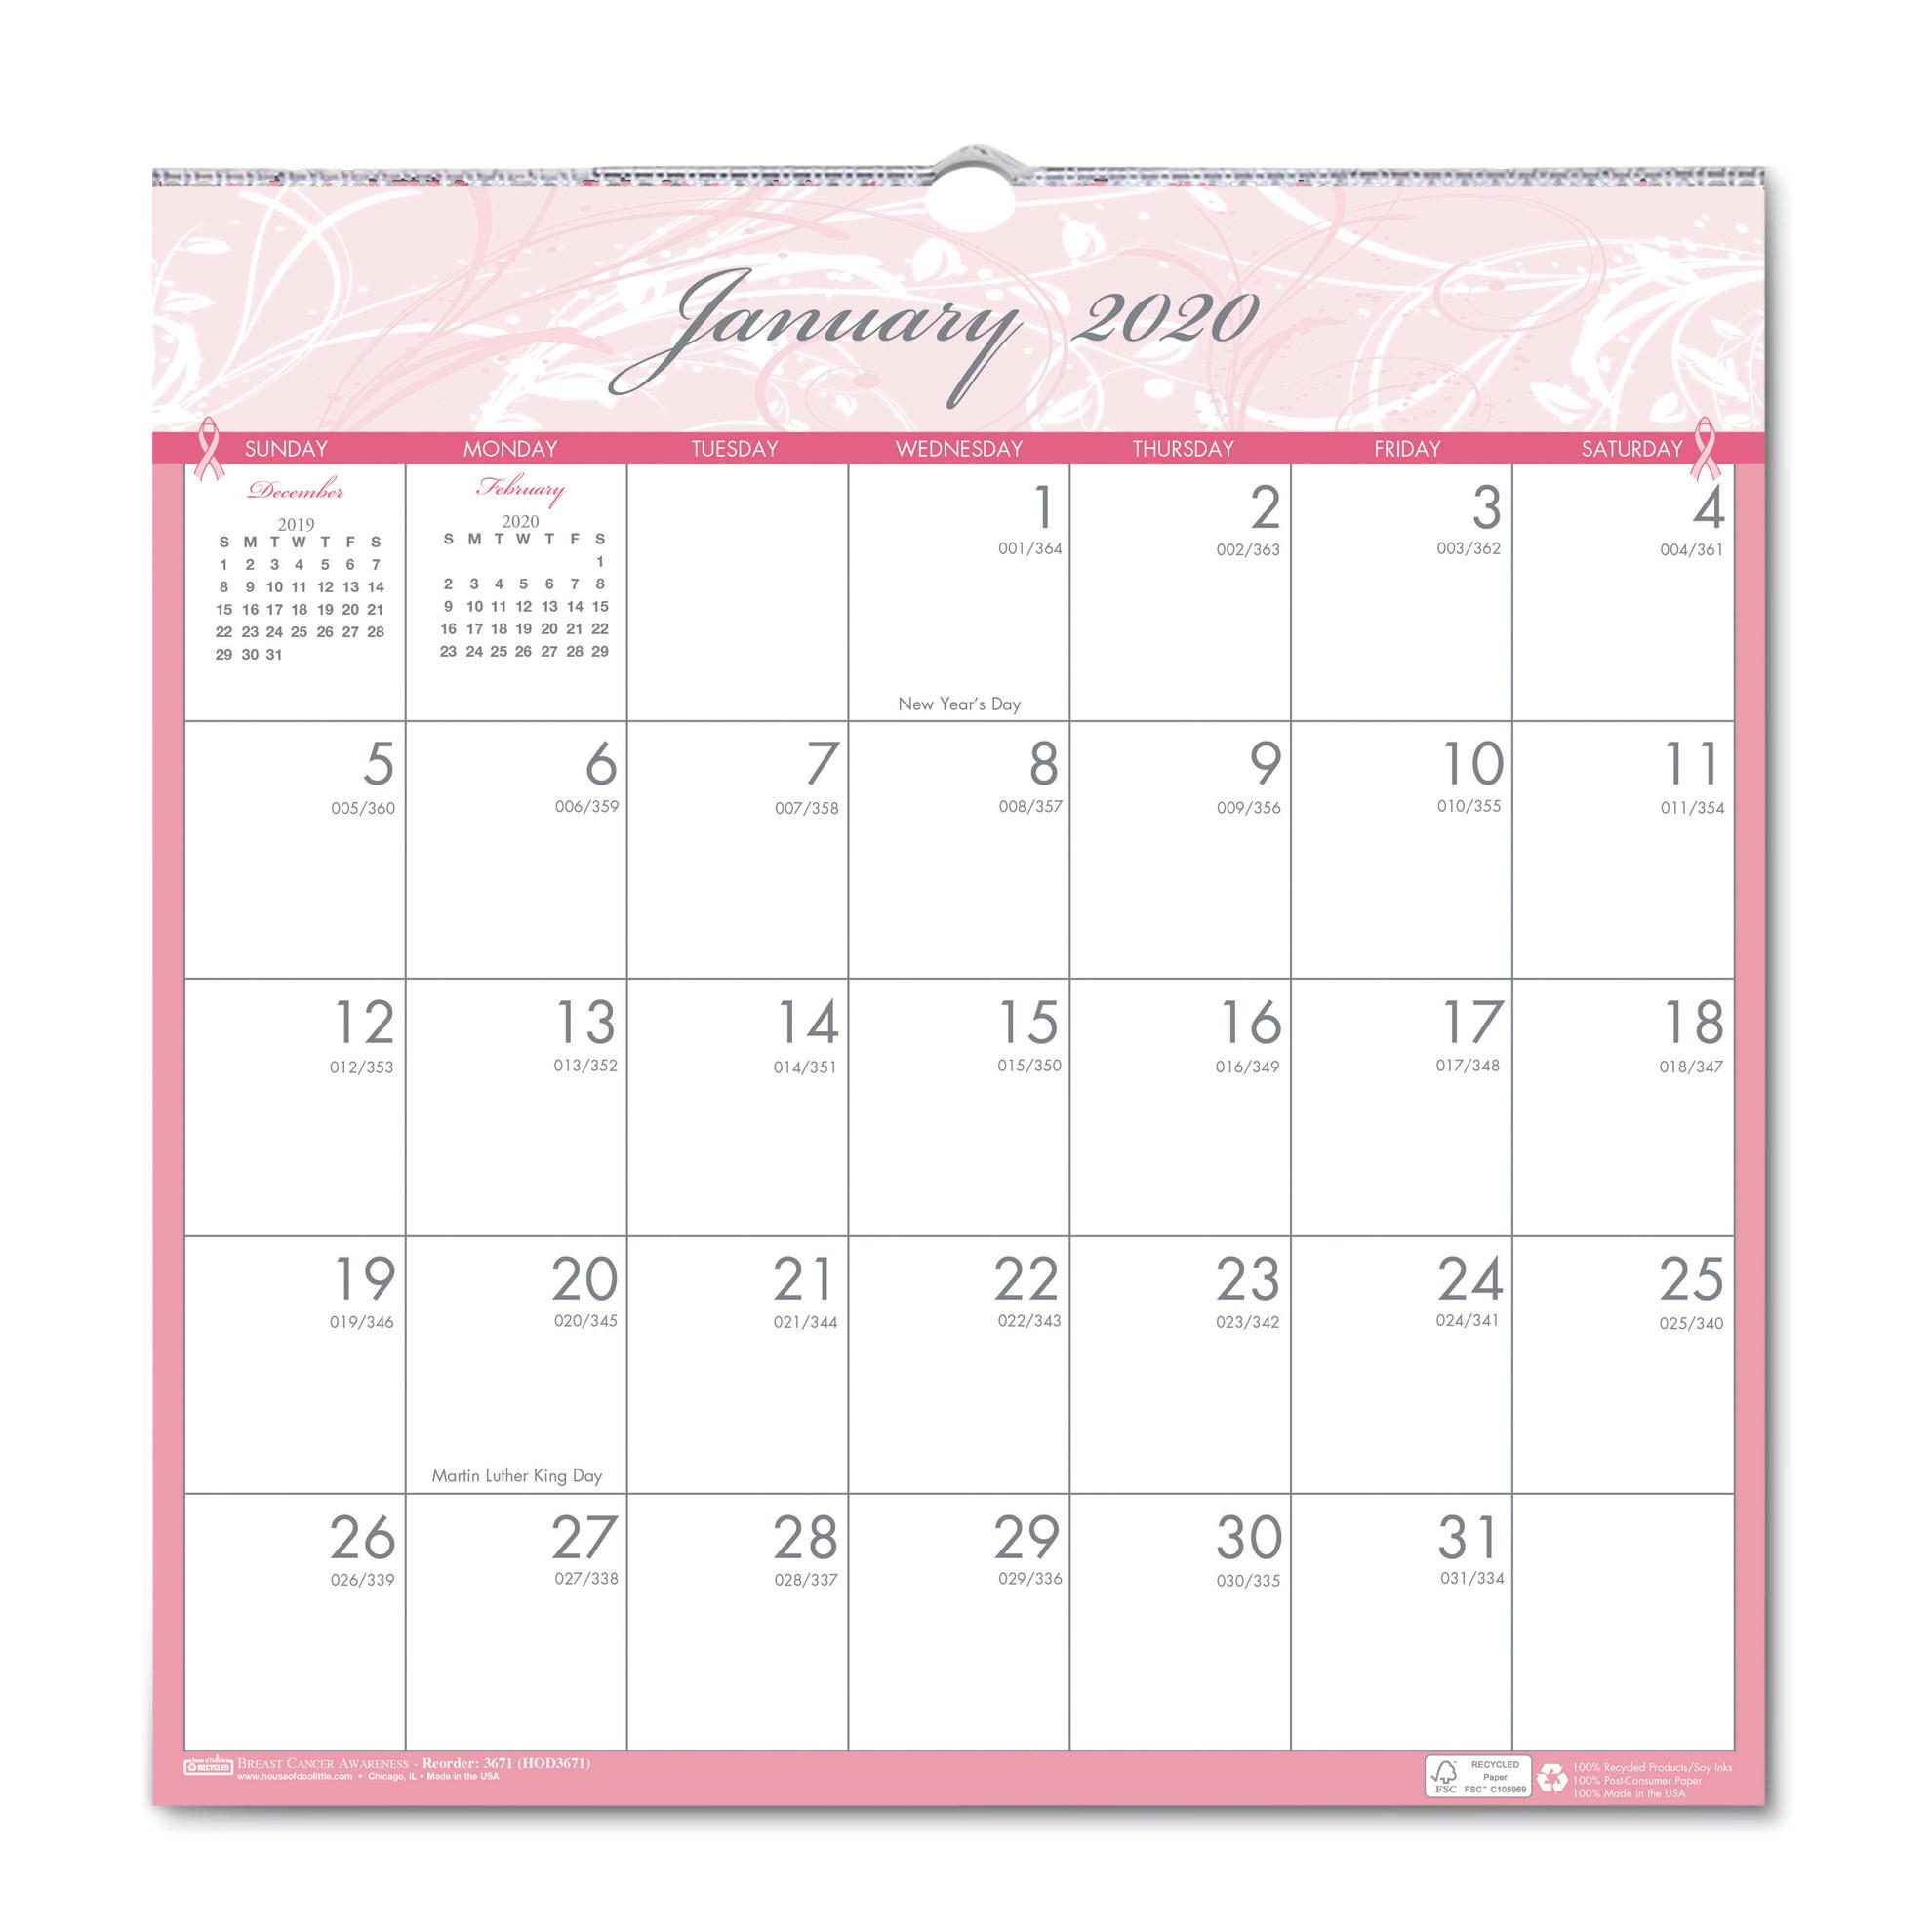 Recycled Breast Cancer Awareness Monthly Wall Calendar, 12 X inside 12X12 Calendar Holder